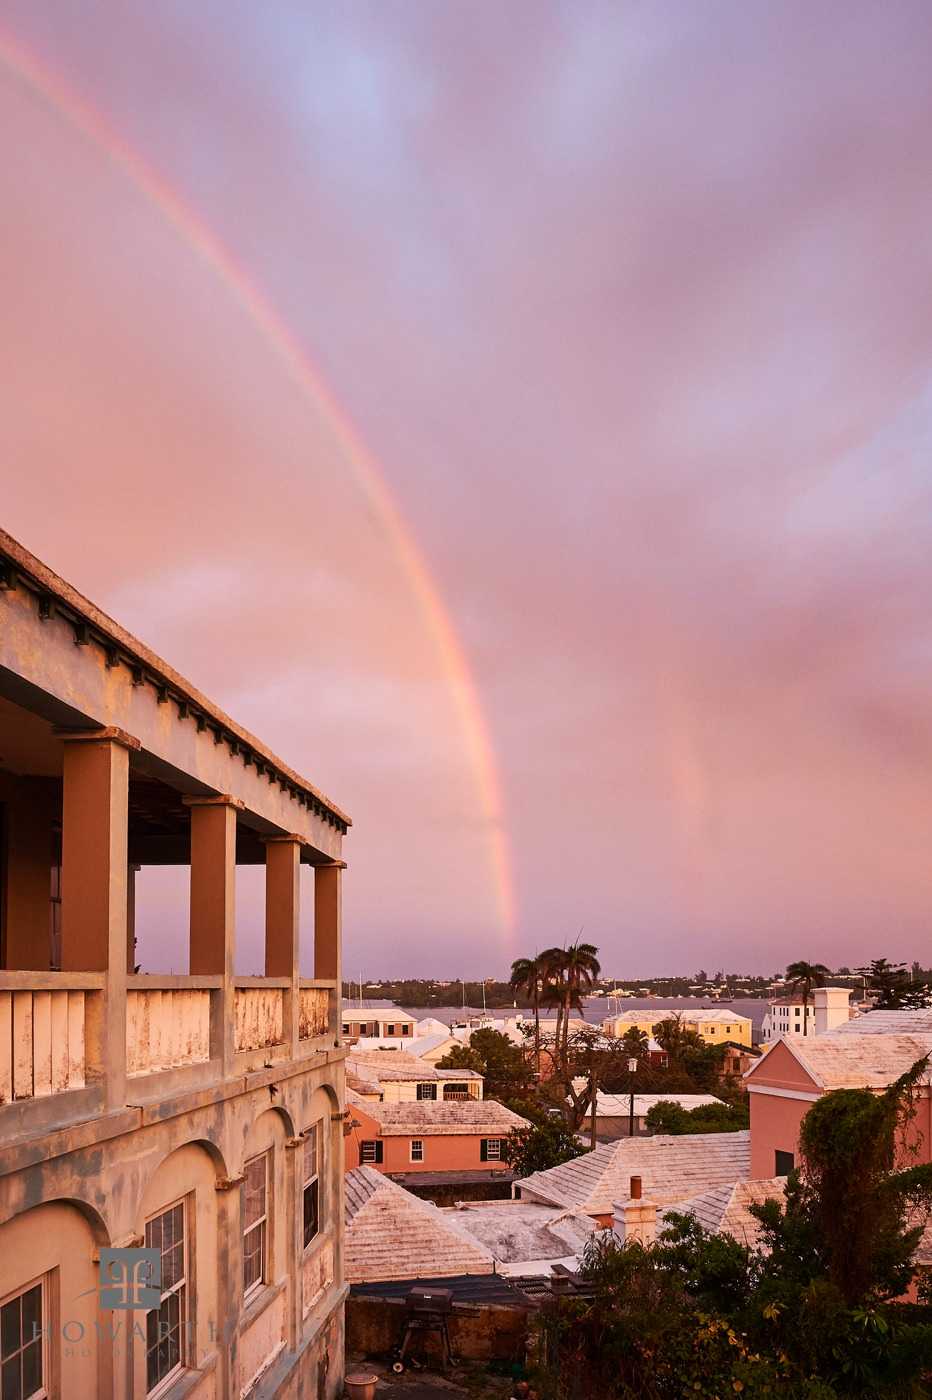 Rainbow, St. Georges, photo